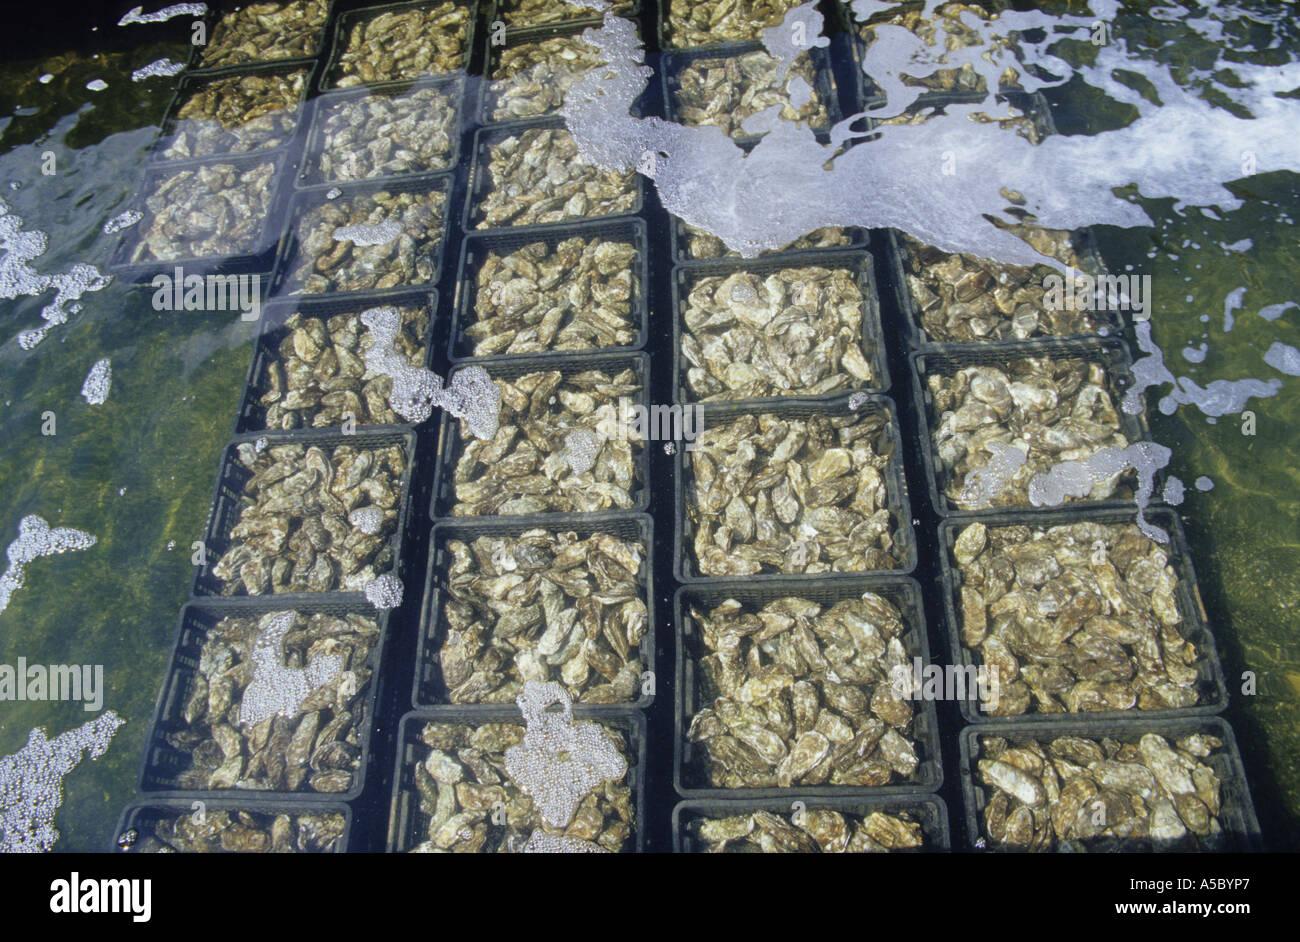 Yerseke Oysters Yeseke oyster farm Zeeland Netherlands Stock Roya